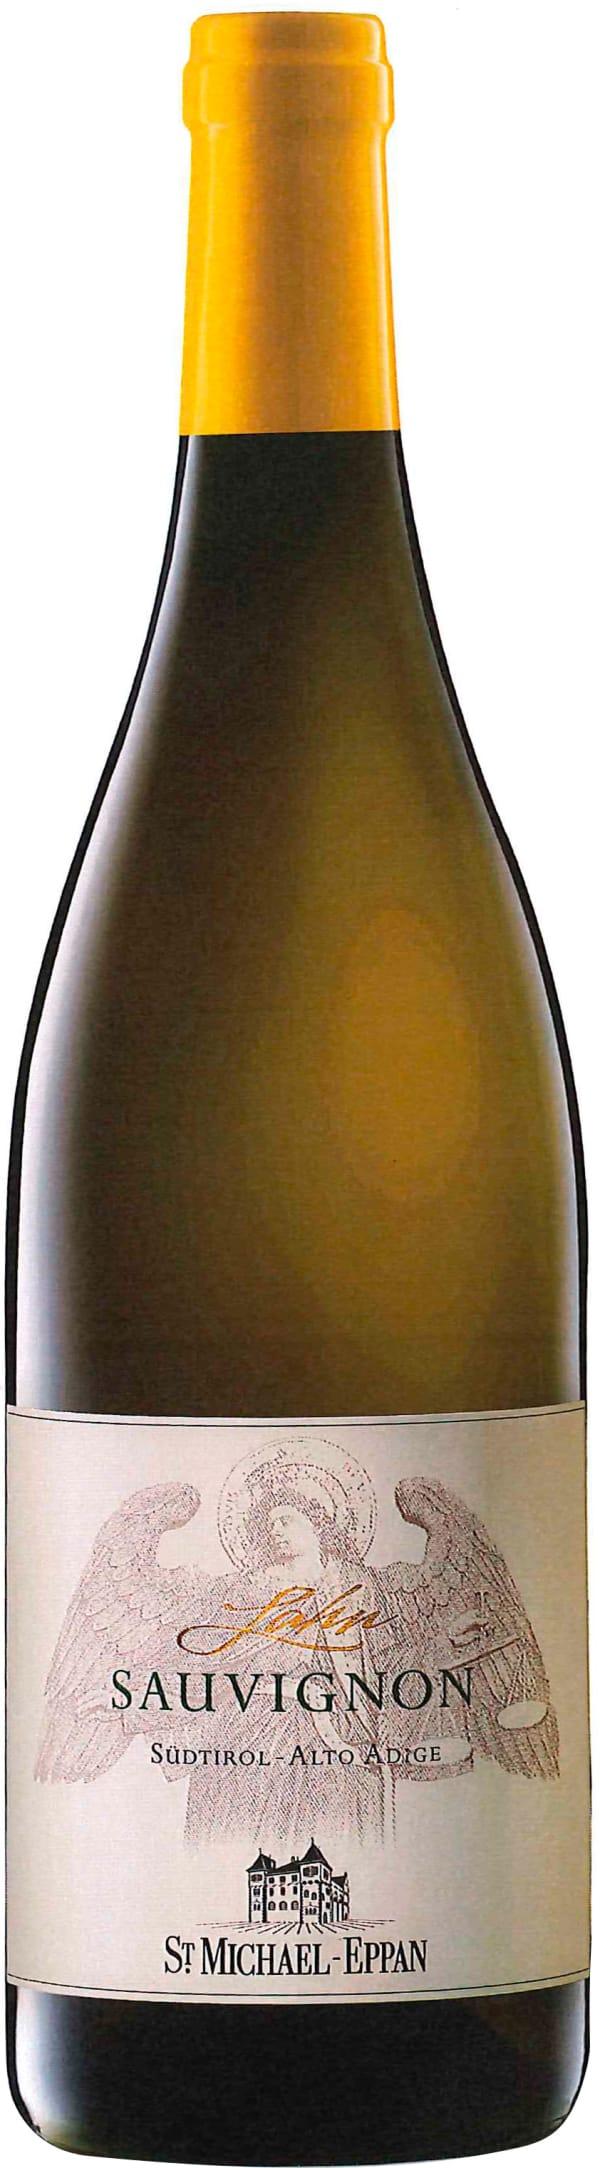 Kellerei St. Michael-Eppan Lahn Sauvignon Blanc 2017